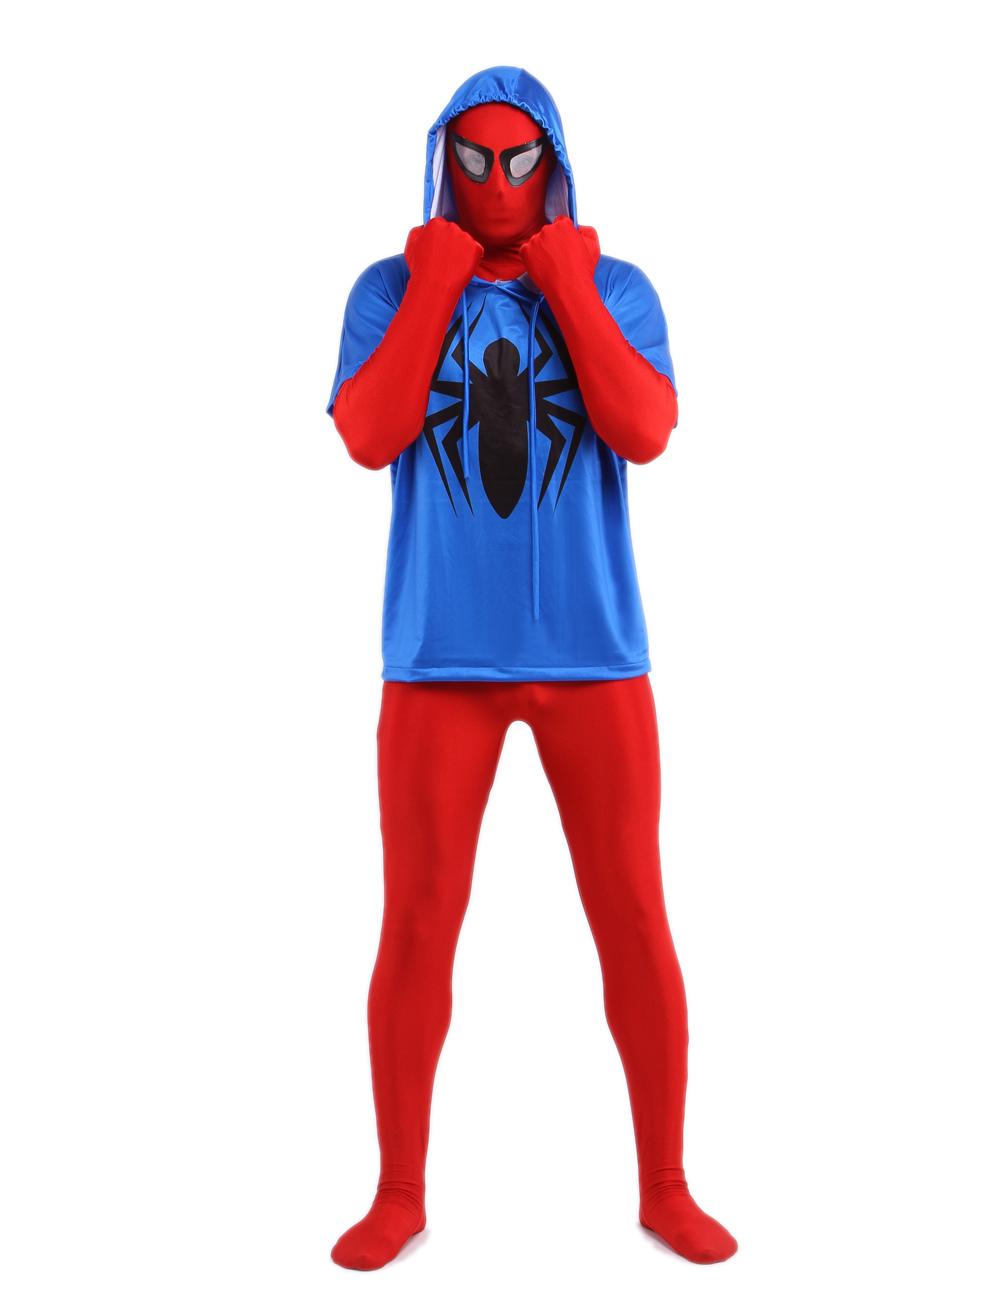 Blue Red Spiderman Zentai Suit Black Spider Print Superhero Halloween Costume with Hood Halloween